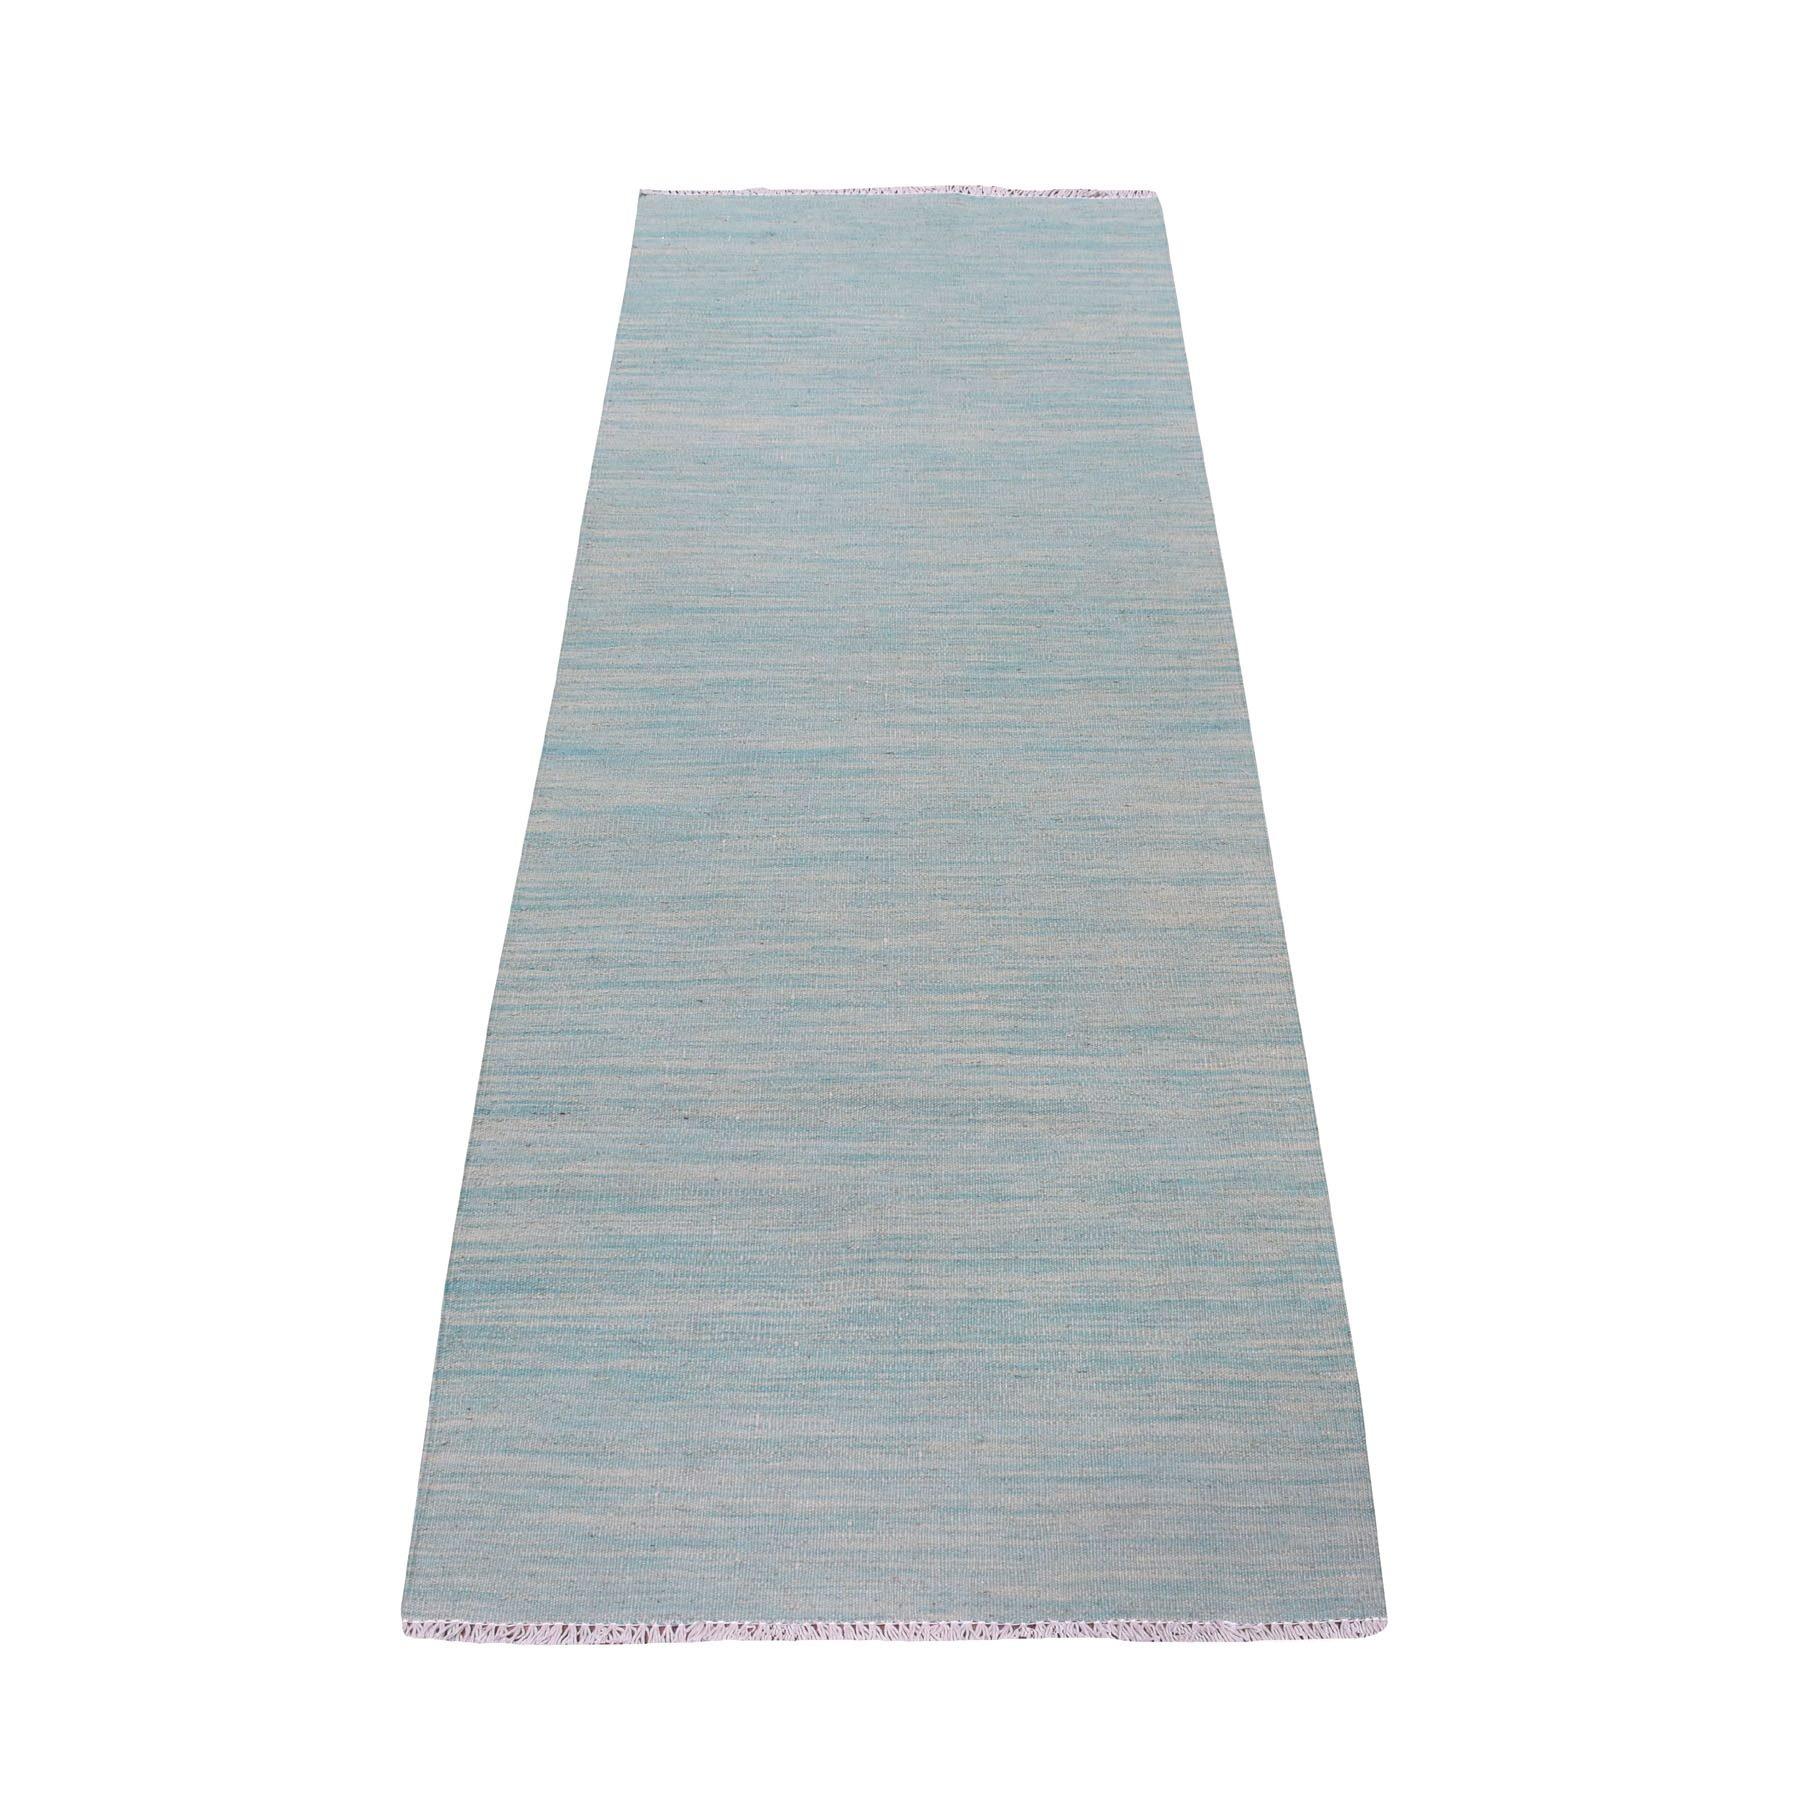 "2'4""x6'3"" Aqua Marine Shades Reversible  Kilim Pure Wool Hand Woven Oriental Runner Rug"